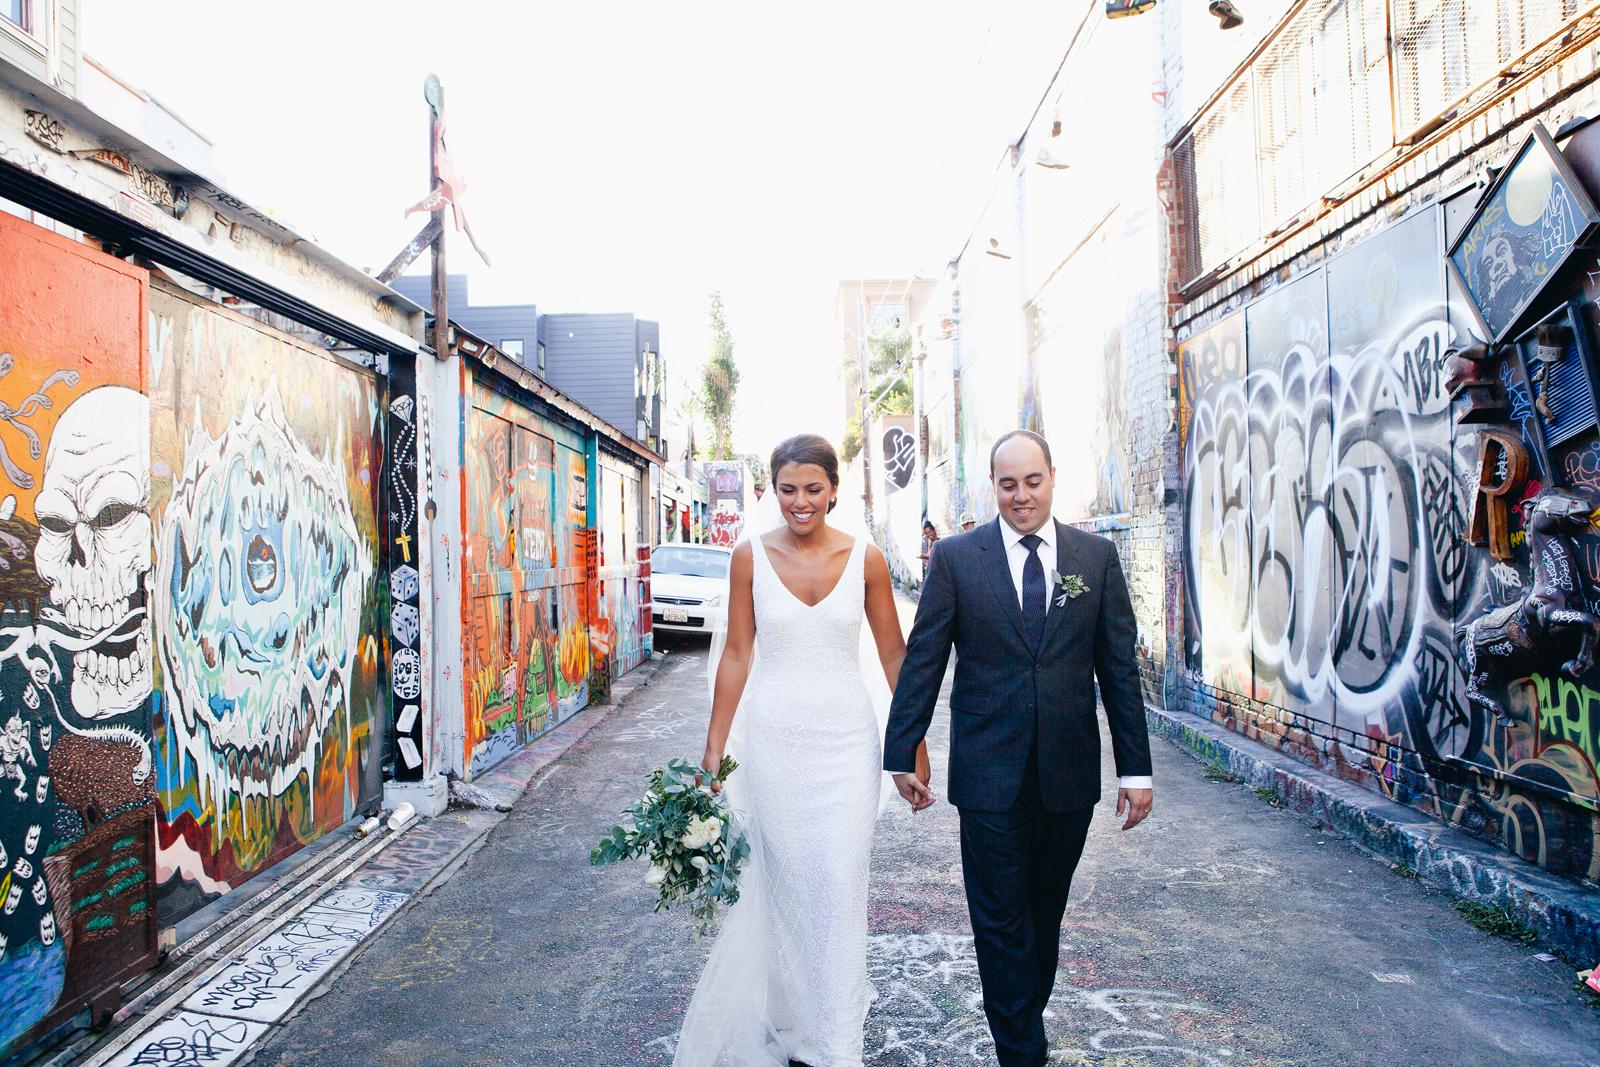 temple_emmanuel_jewish_wedding_san_francisco_ca_sarah_andrew_ebony_siovhan_bokeh_photography_66.jpg